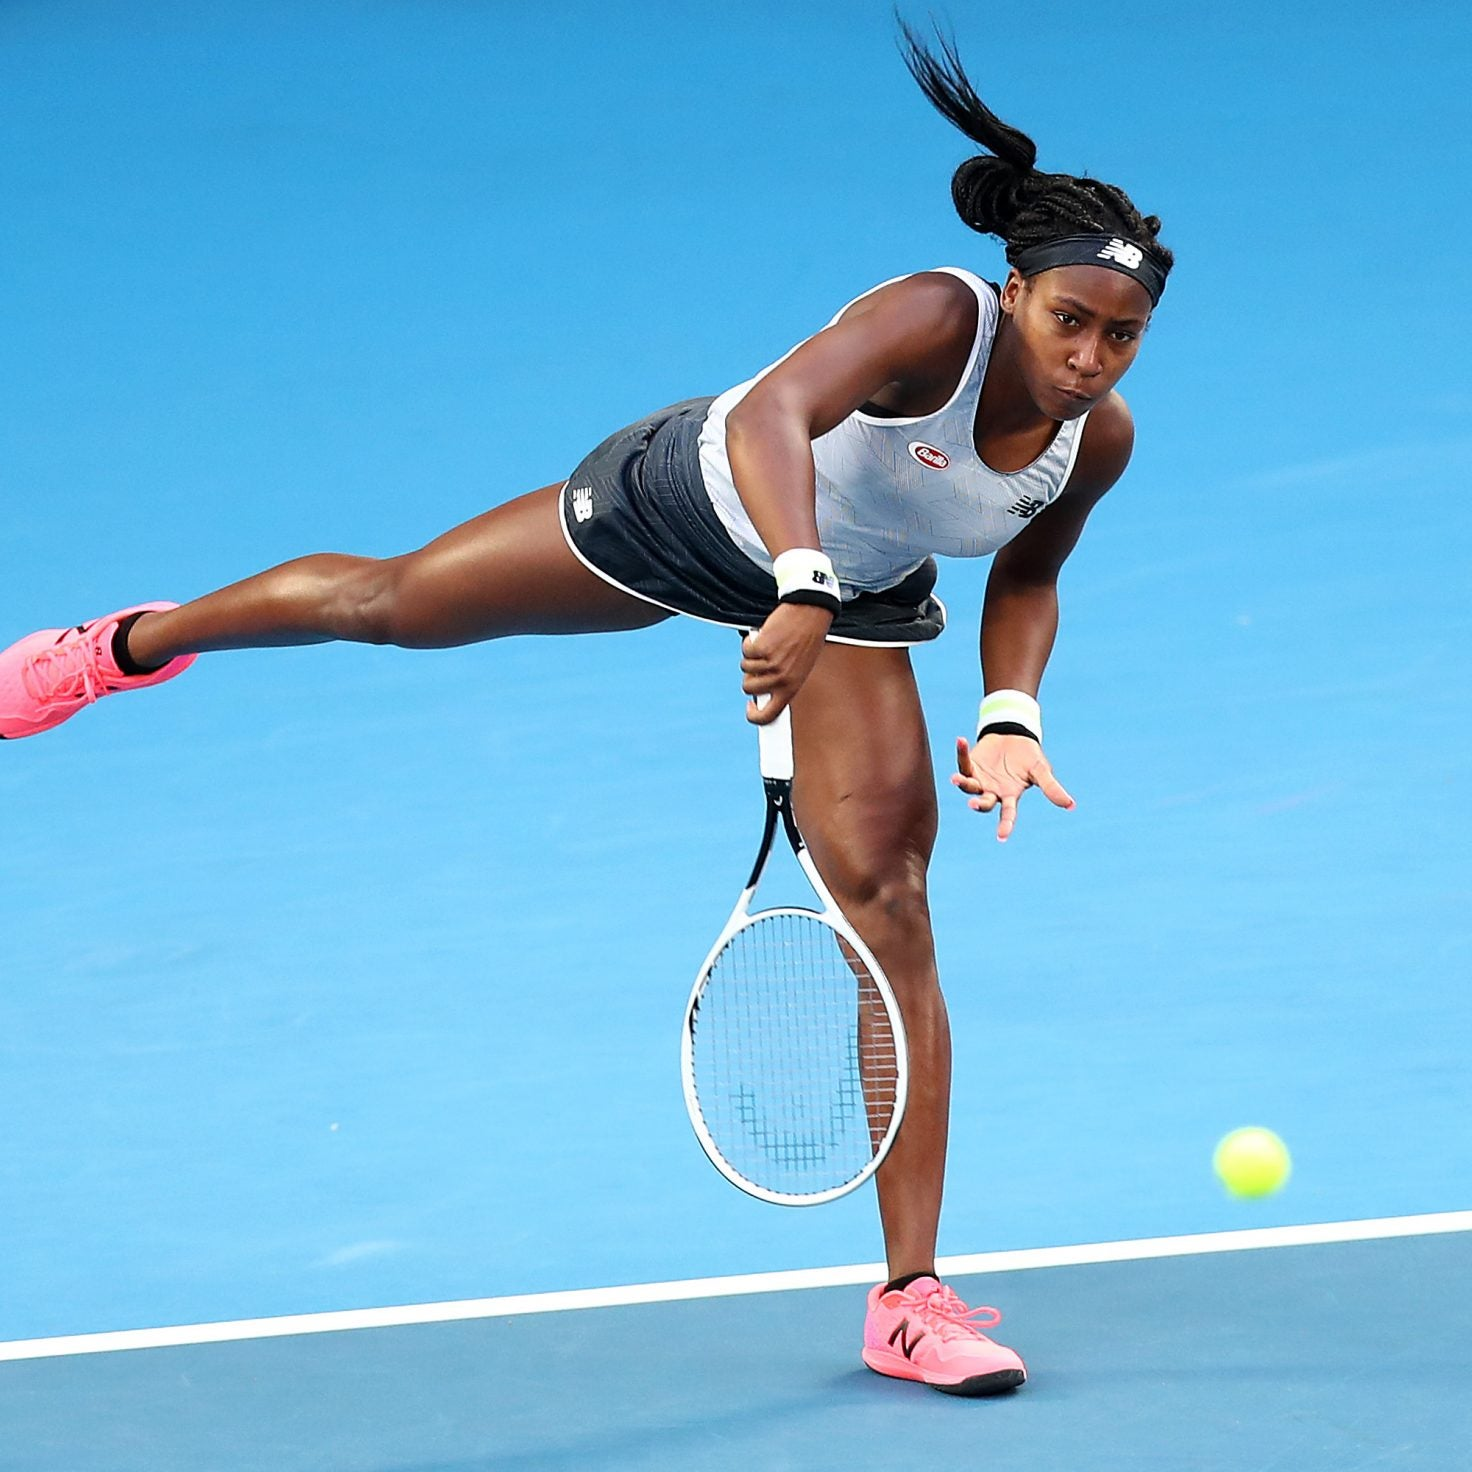 Coco Gauff Defeats Defending Champ Naomi Osaka At 2020 Australian Open